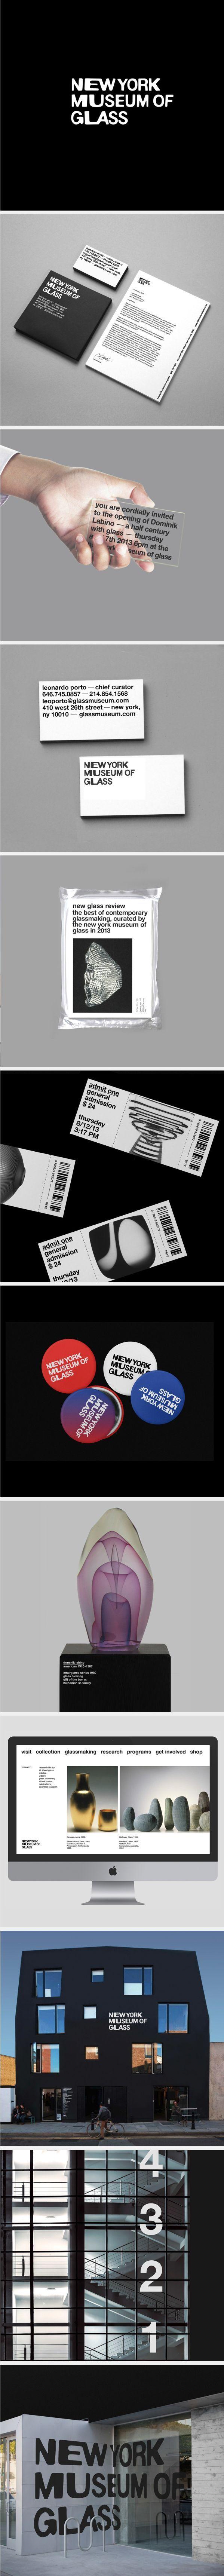 490 best Branding & Visual Identity images on Pinterest